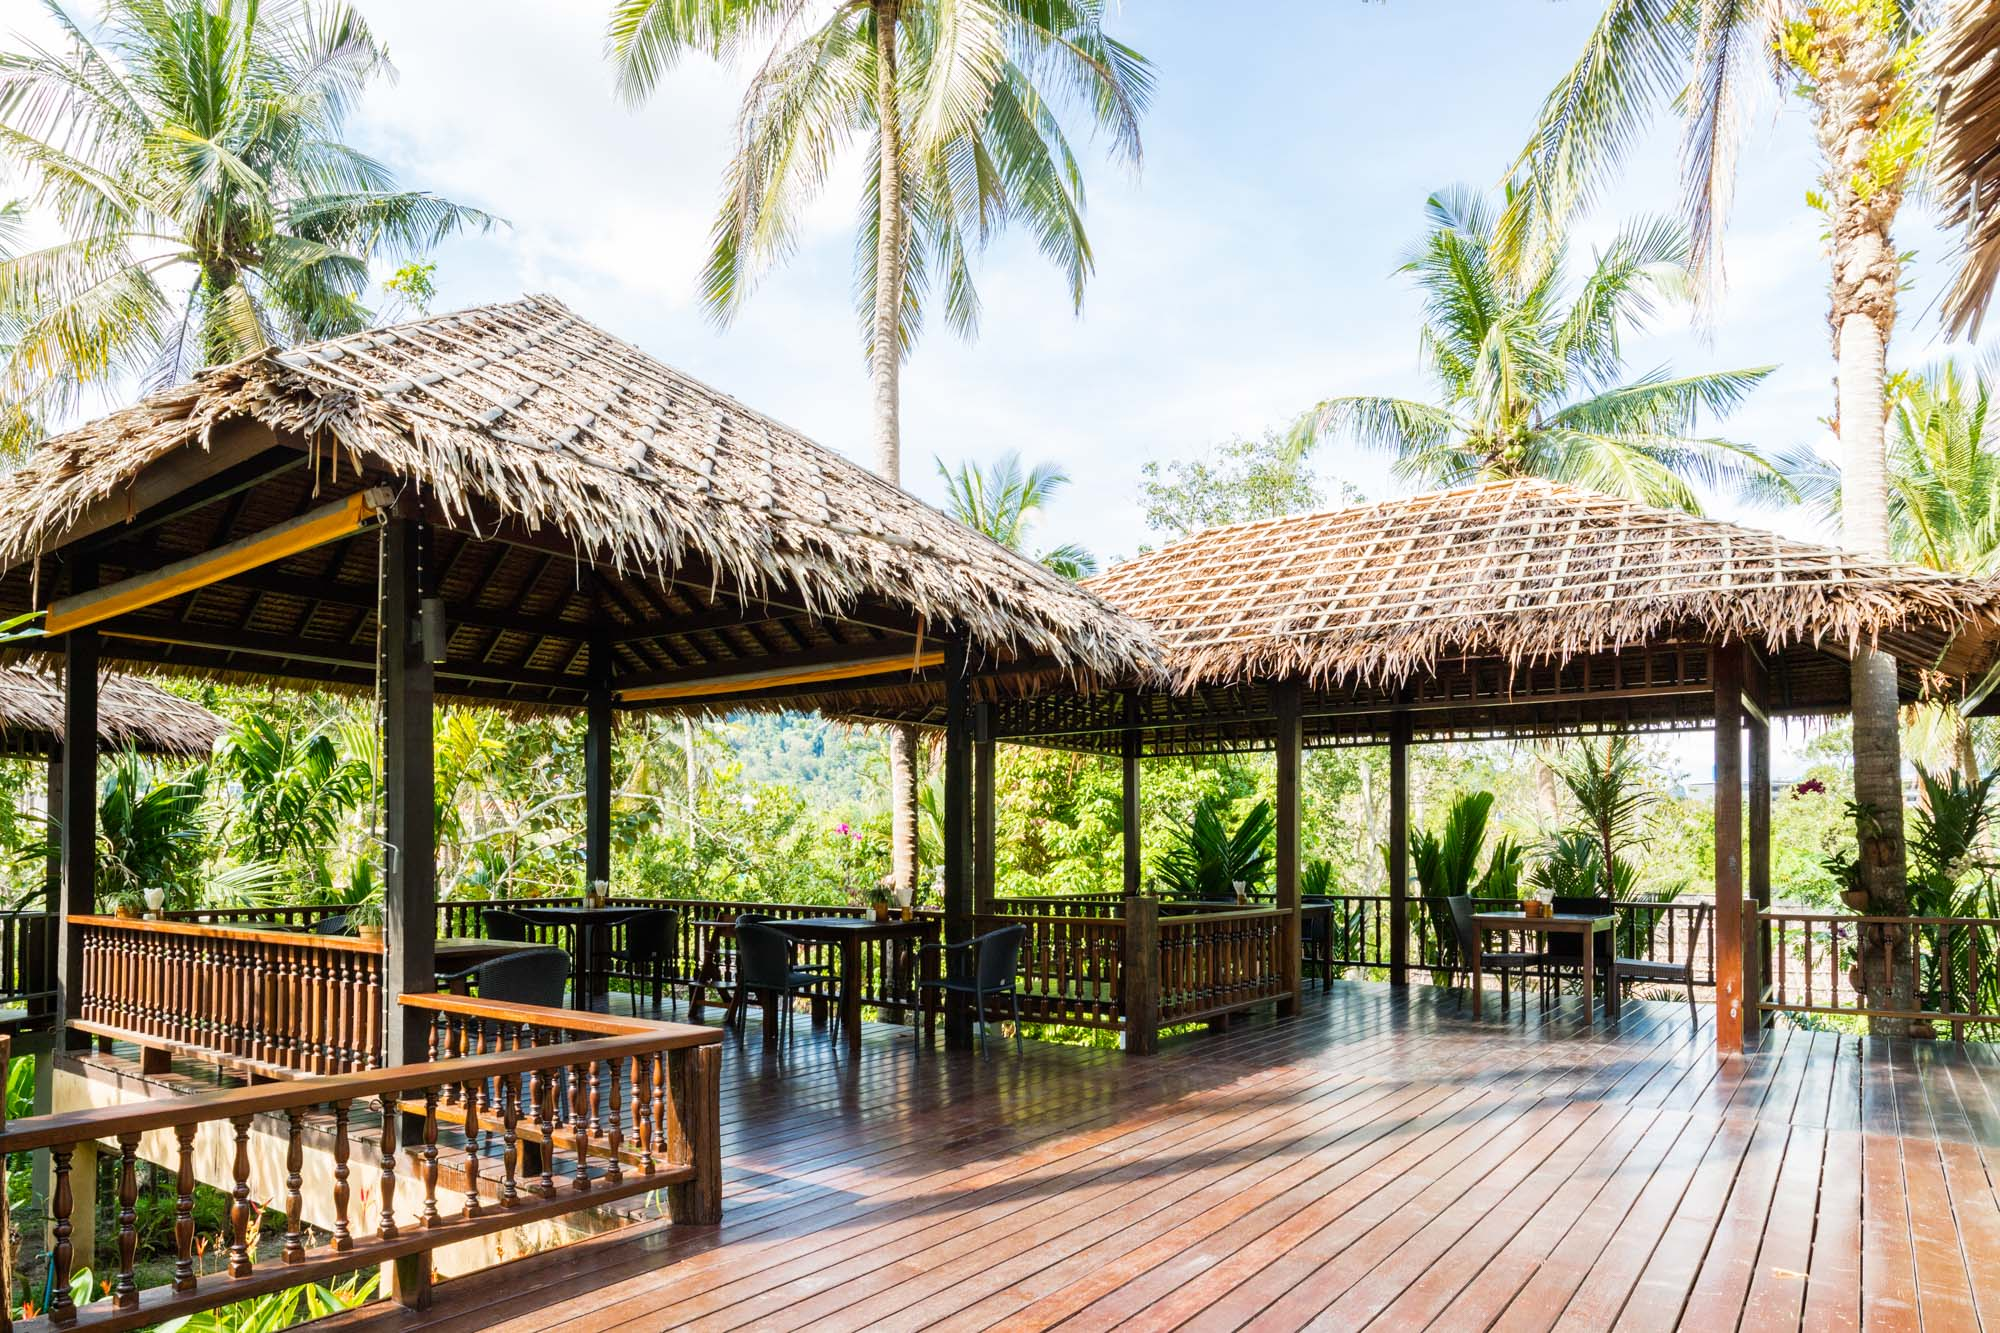 Ban Sainai Resort , Ao Nang, Thailand - Traveloka  บ้านใสใน รีสอร์ท Ban Sainai Resort อ่าวนาง กระบี่ IMG 2013